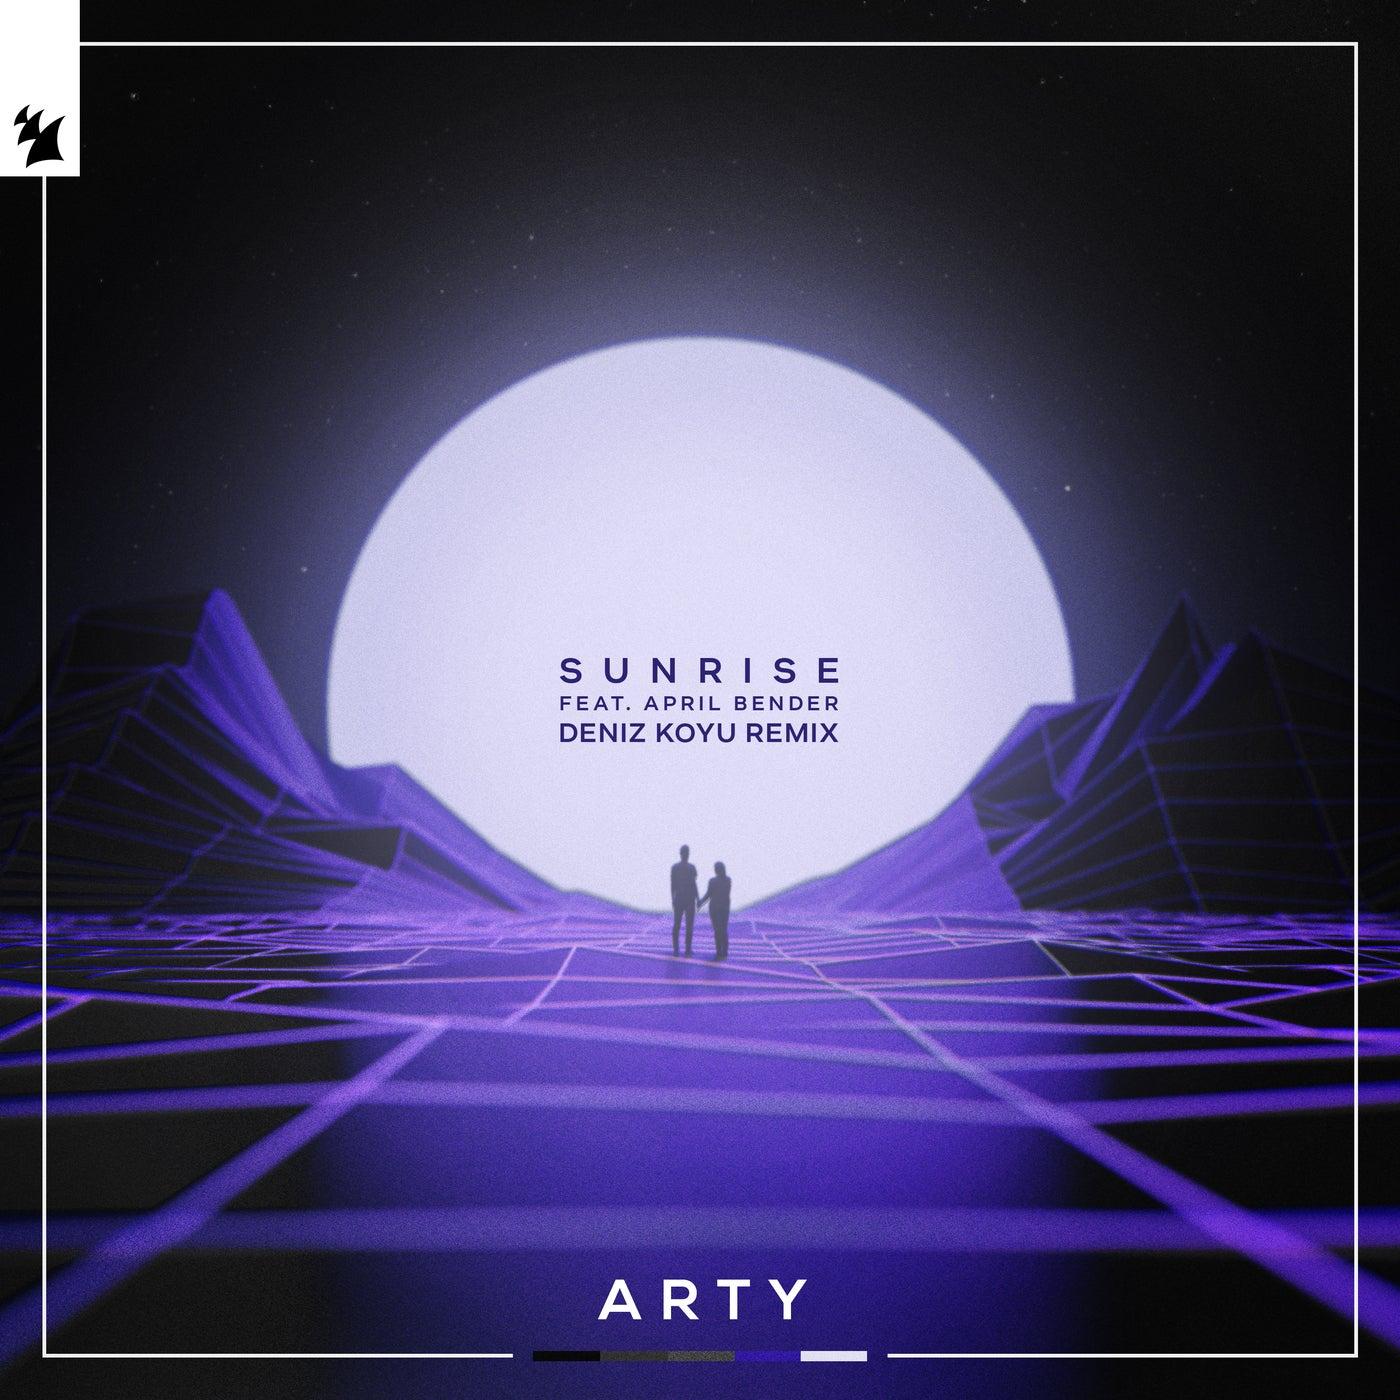 Sunrise feat. April Bender (Deniz Koyu Extended Remix)